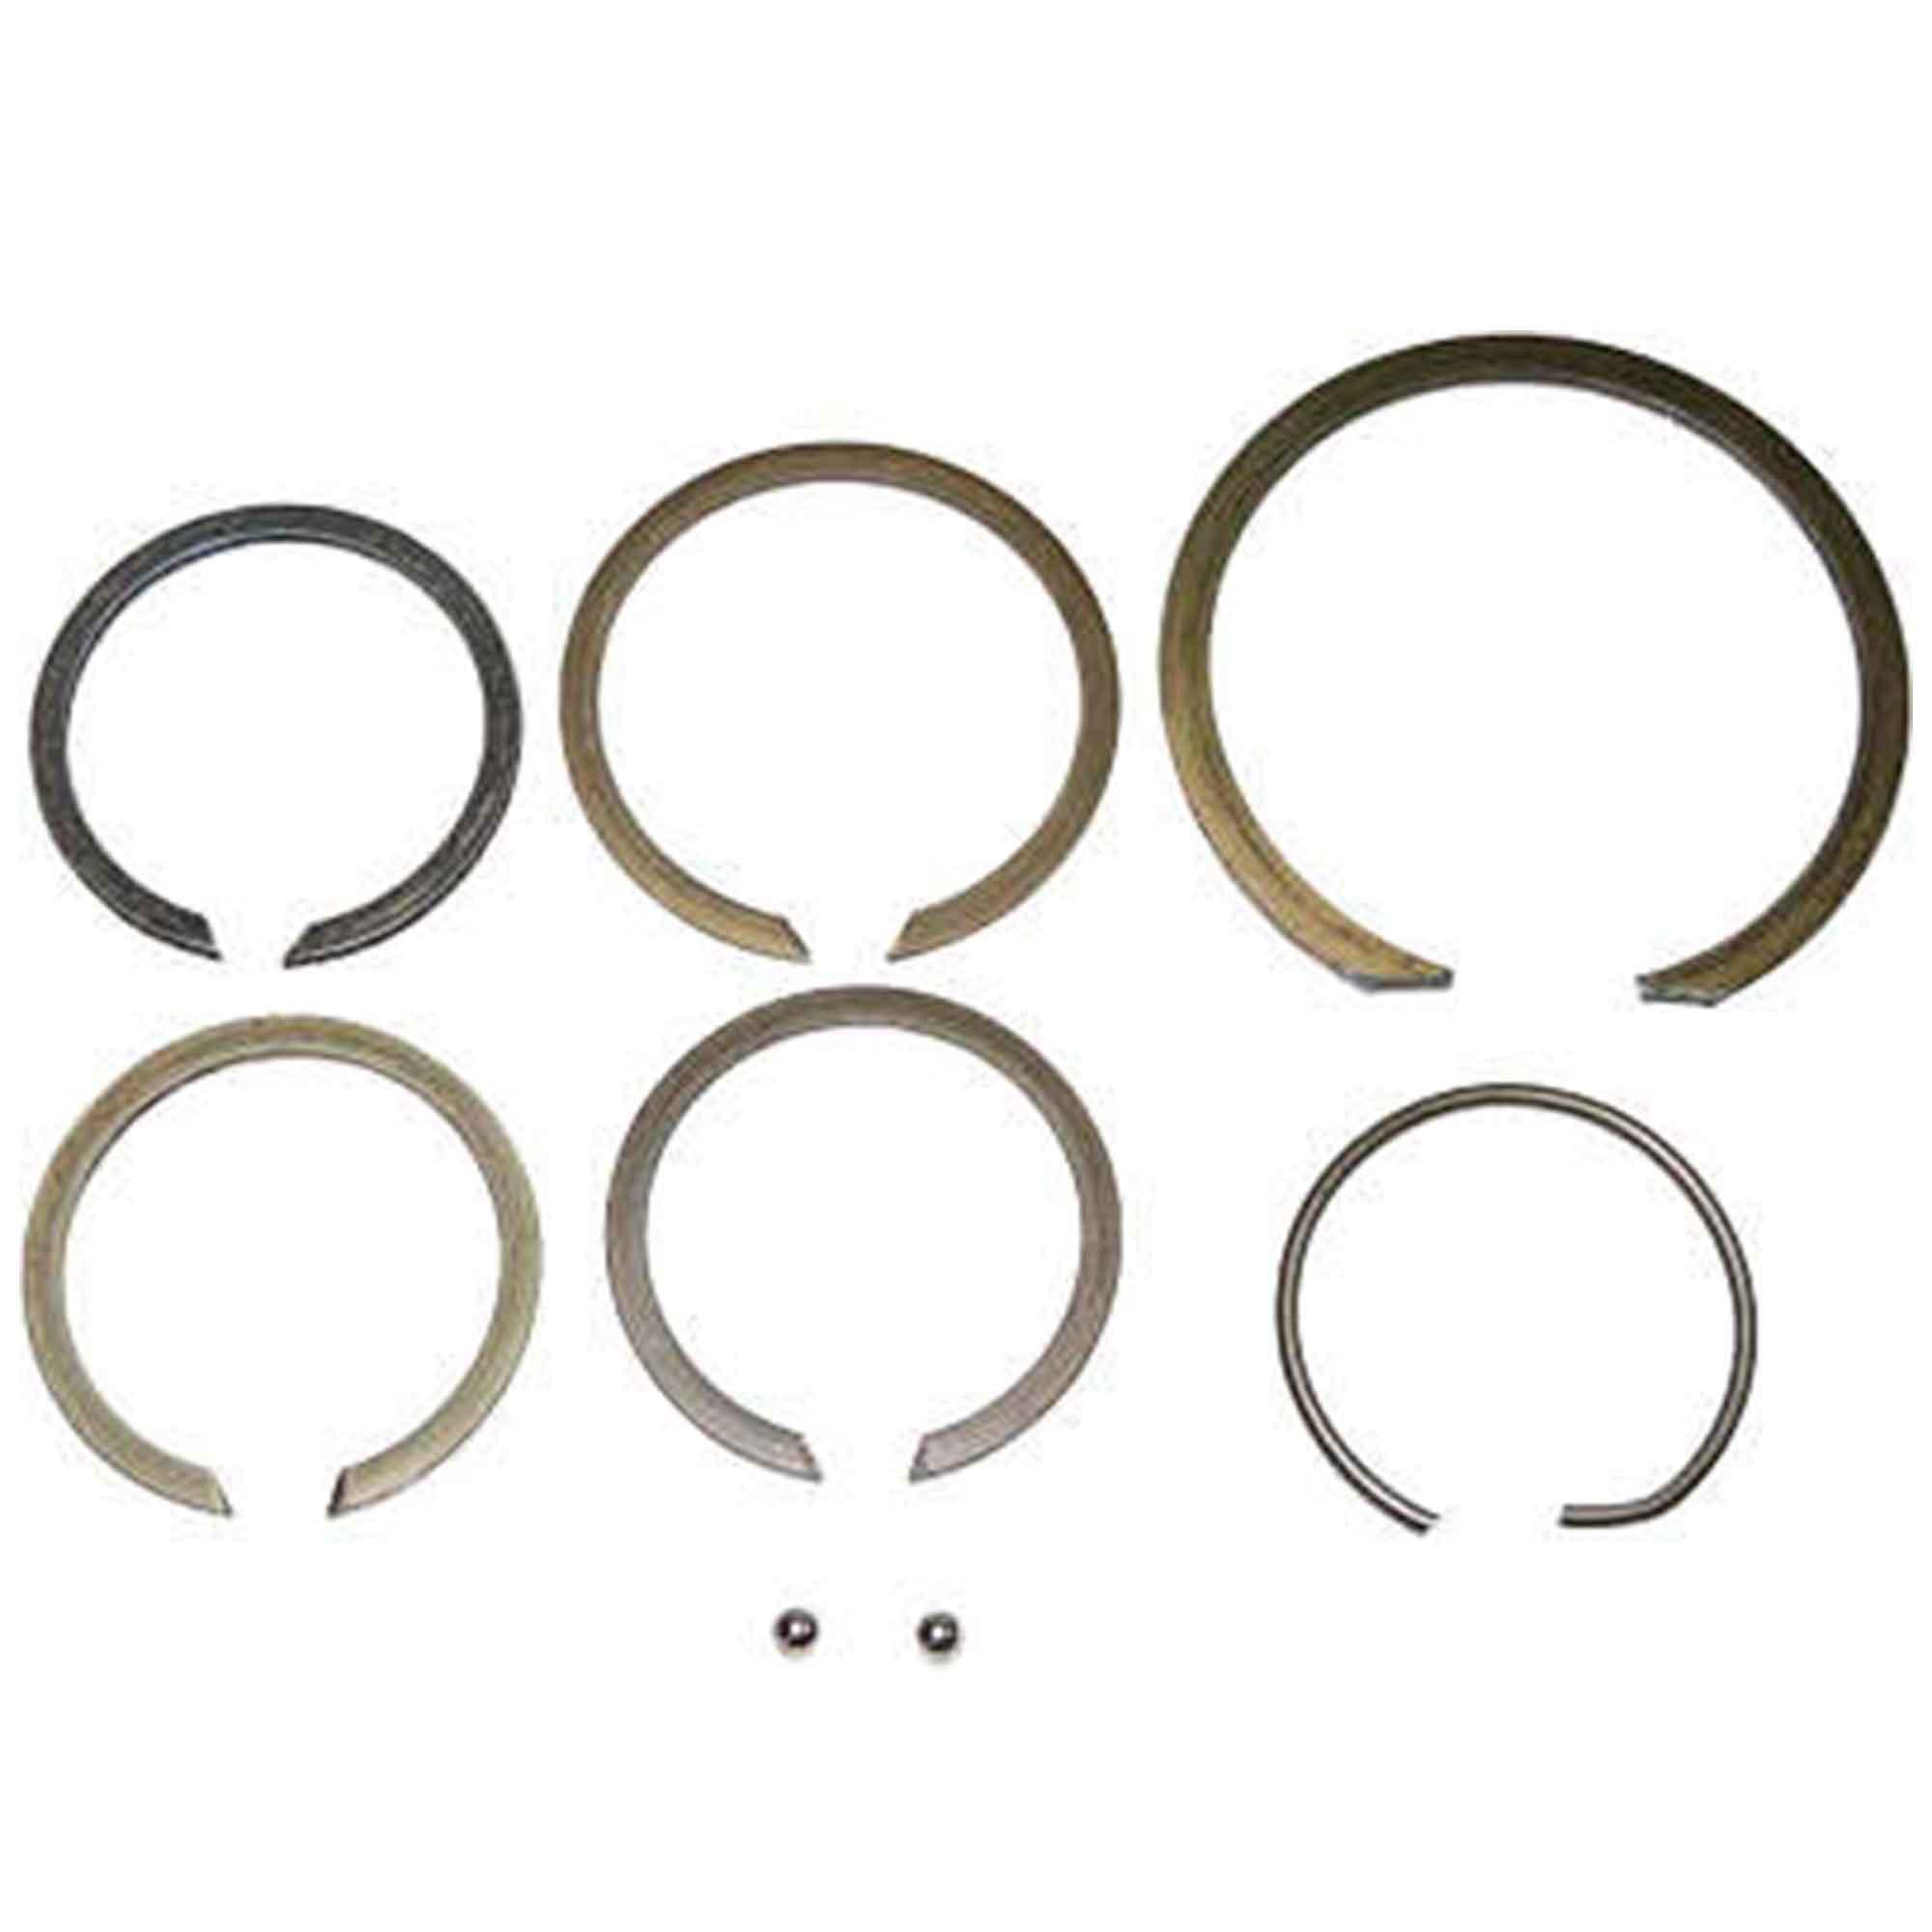 SUK512 - Kit de anéis travas cambio FS4005/4205